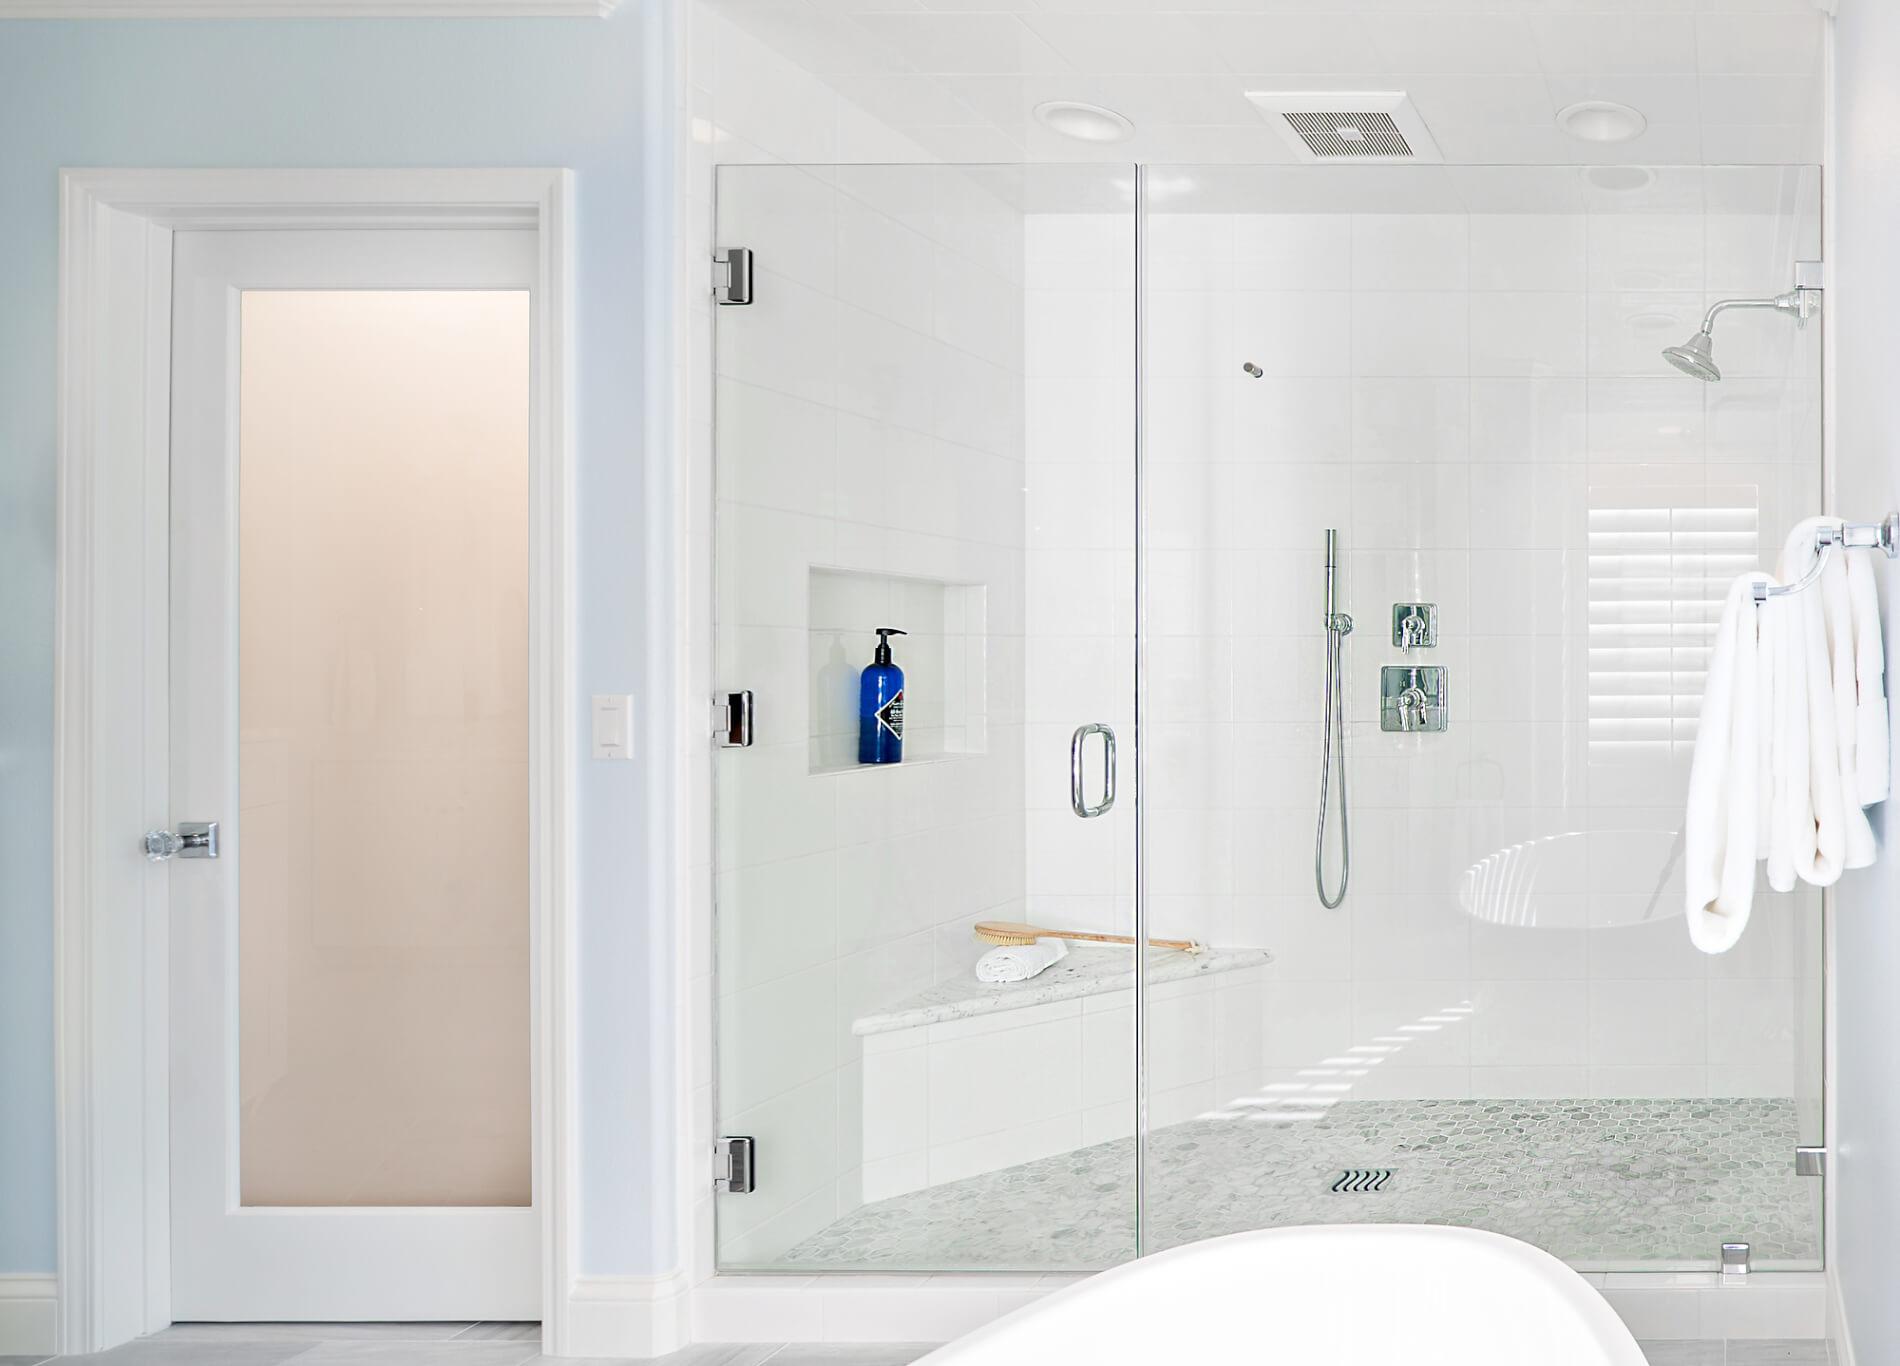 Home Remodeling Companies, Residential Remodeling Companies, Bathroom Remodel